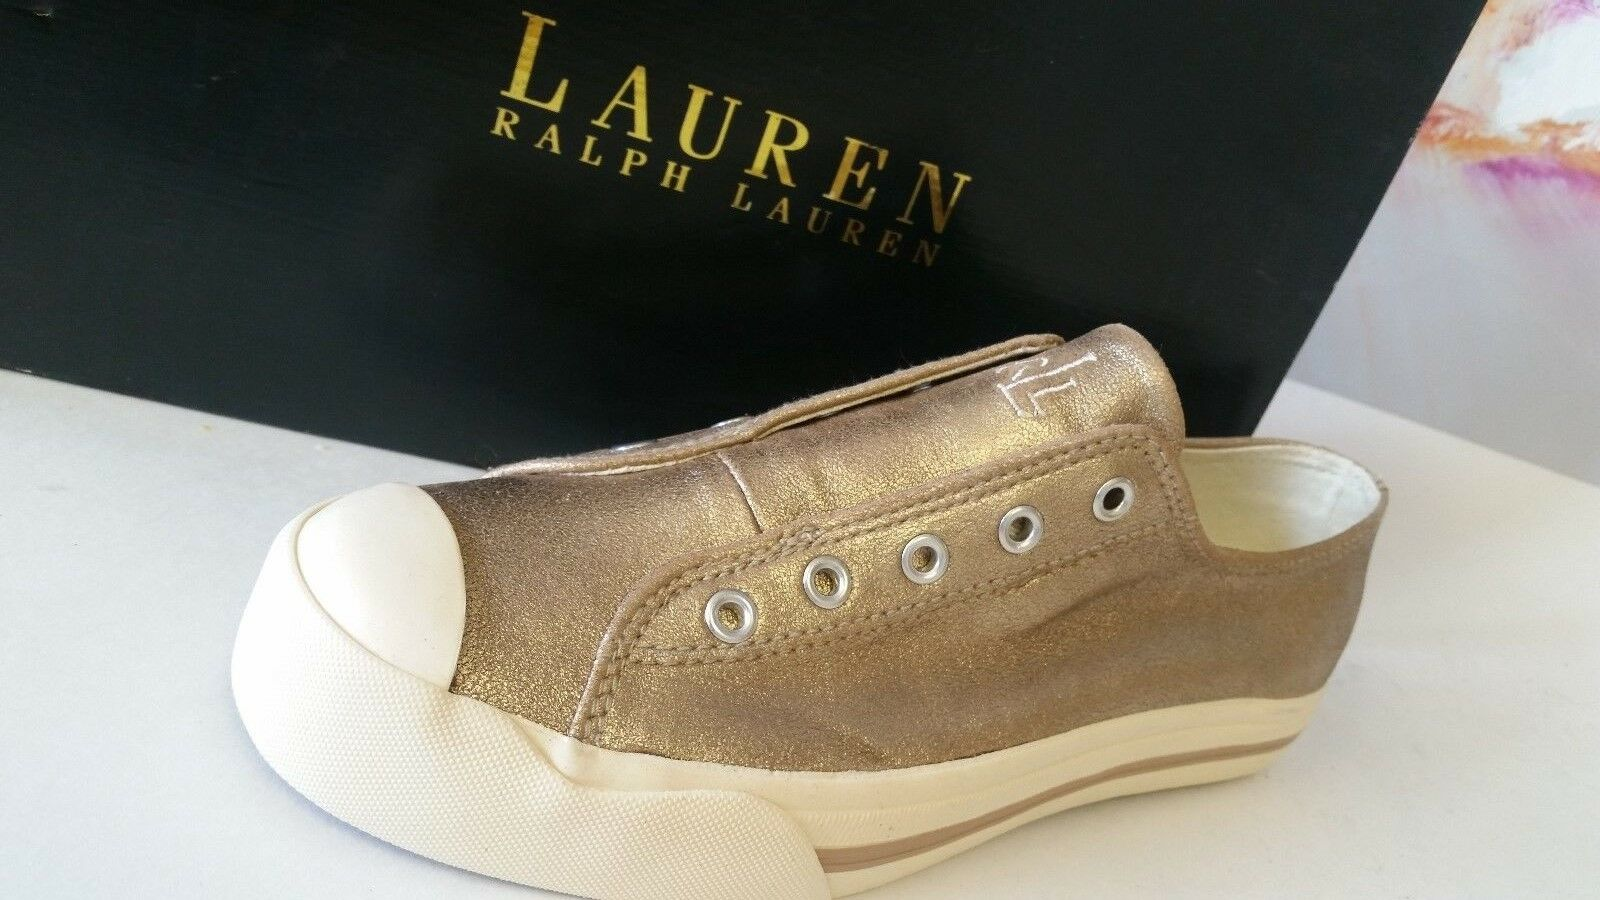 Ralph Lauren Femme Slip on vernissées or en Cuir Baskets Taille 5.5b Excellent